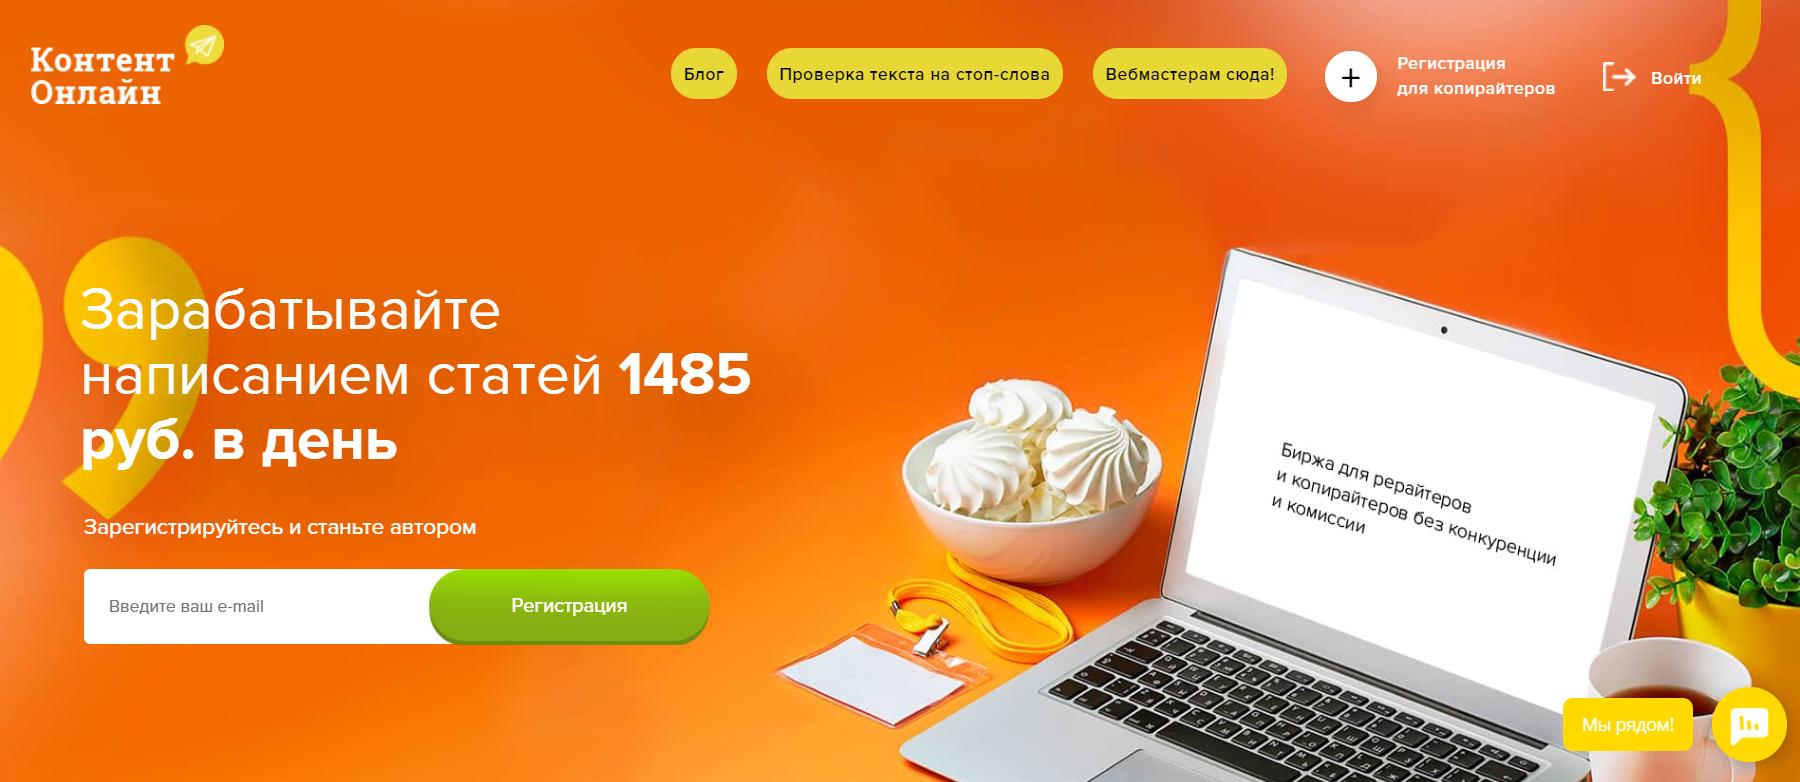 birzha-kopirajtinga-kontent-onlajn